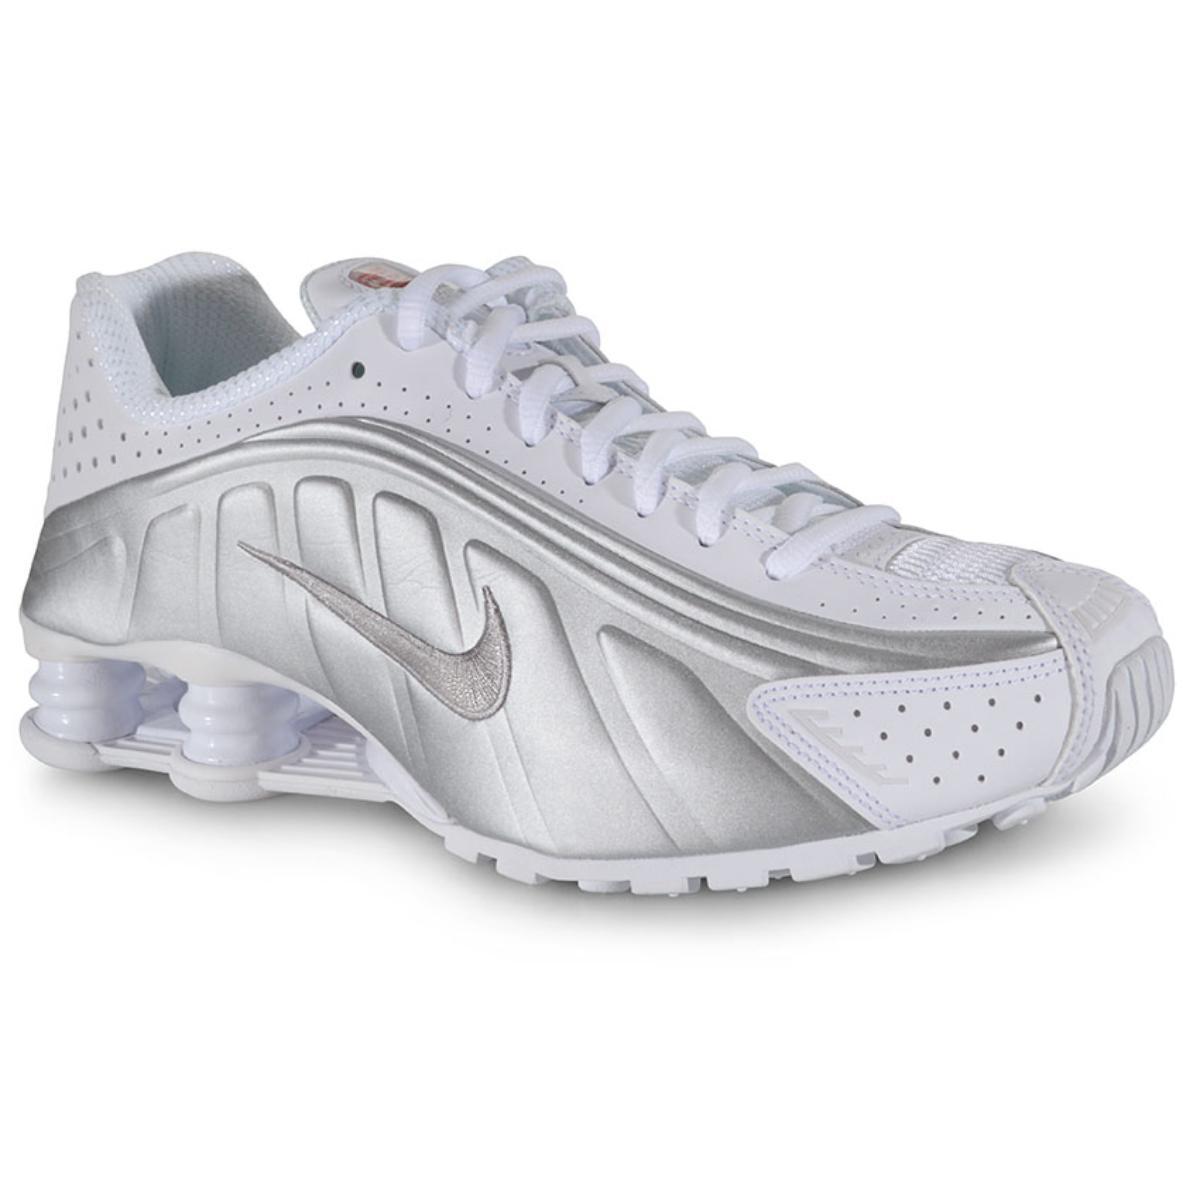 Tênis Masculino Nike 104265-131 Shox r4 Branco/prata